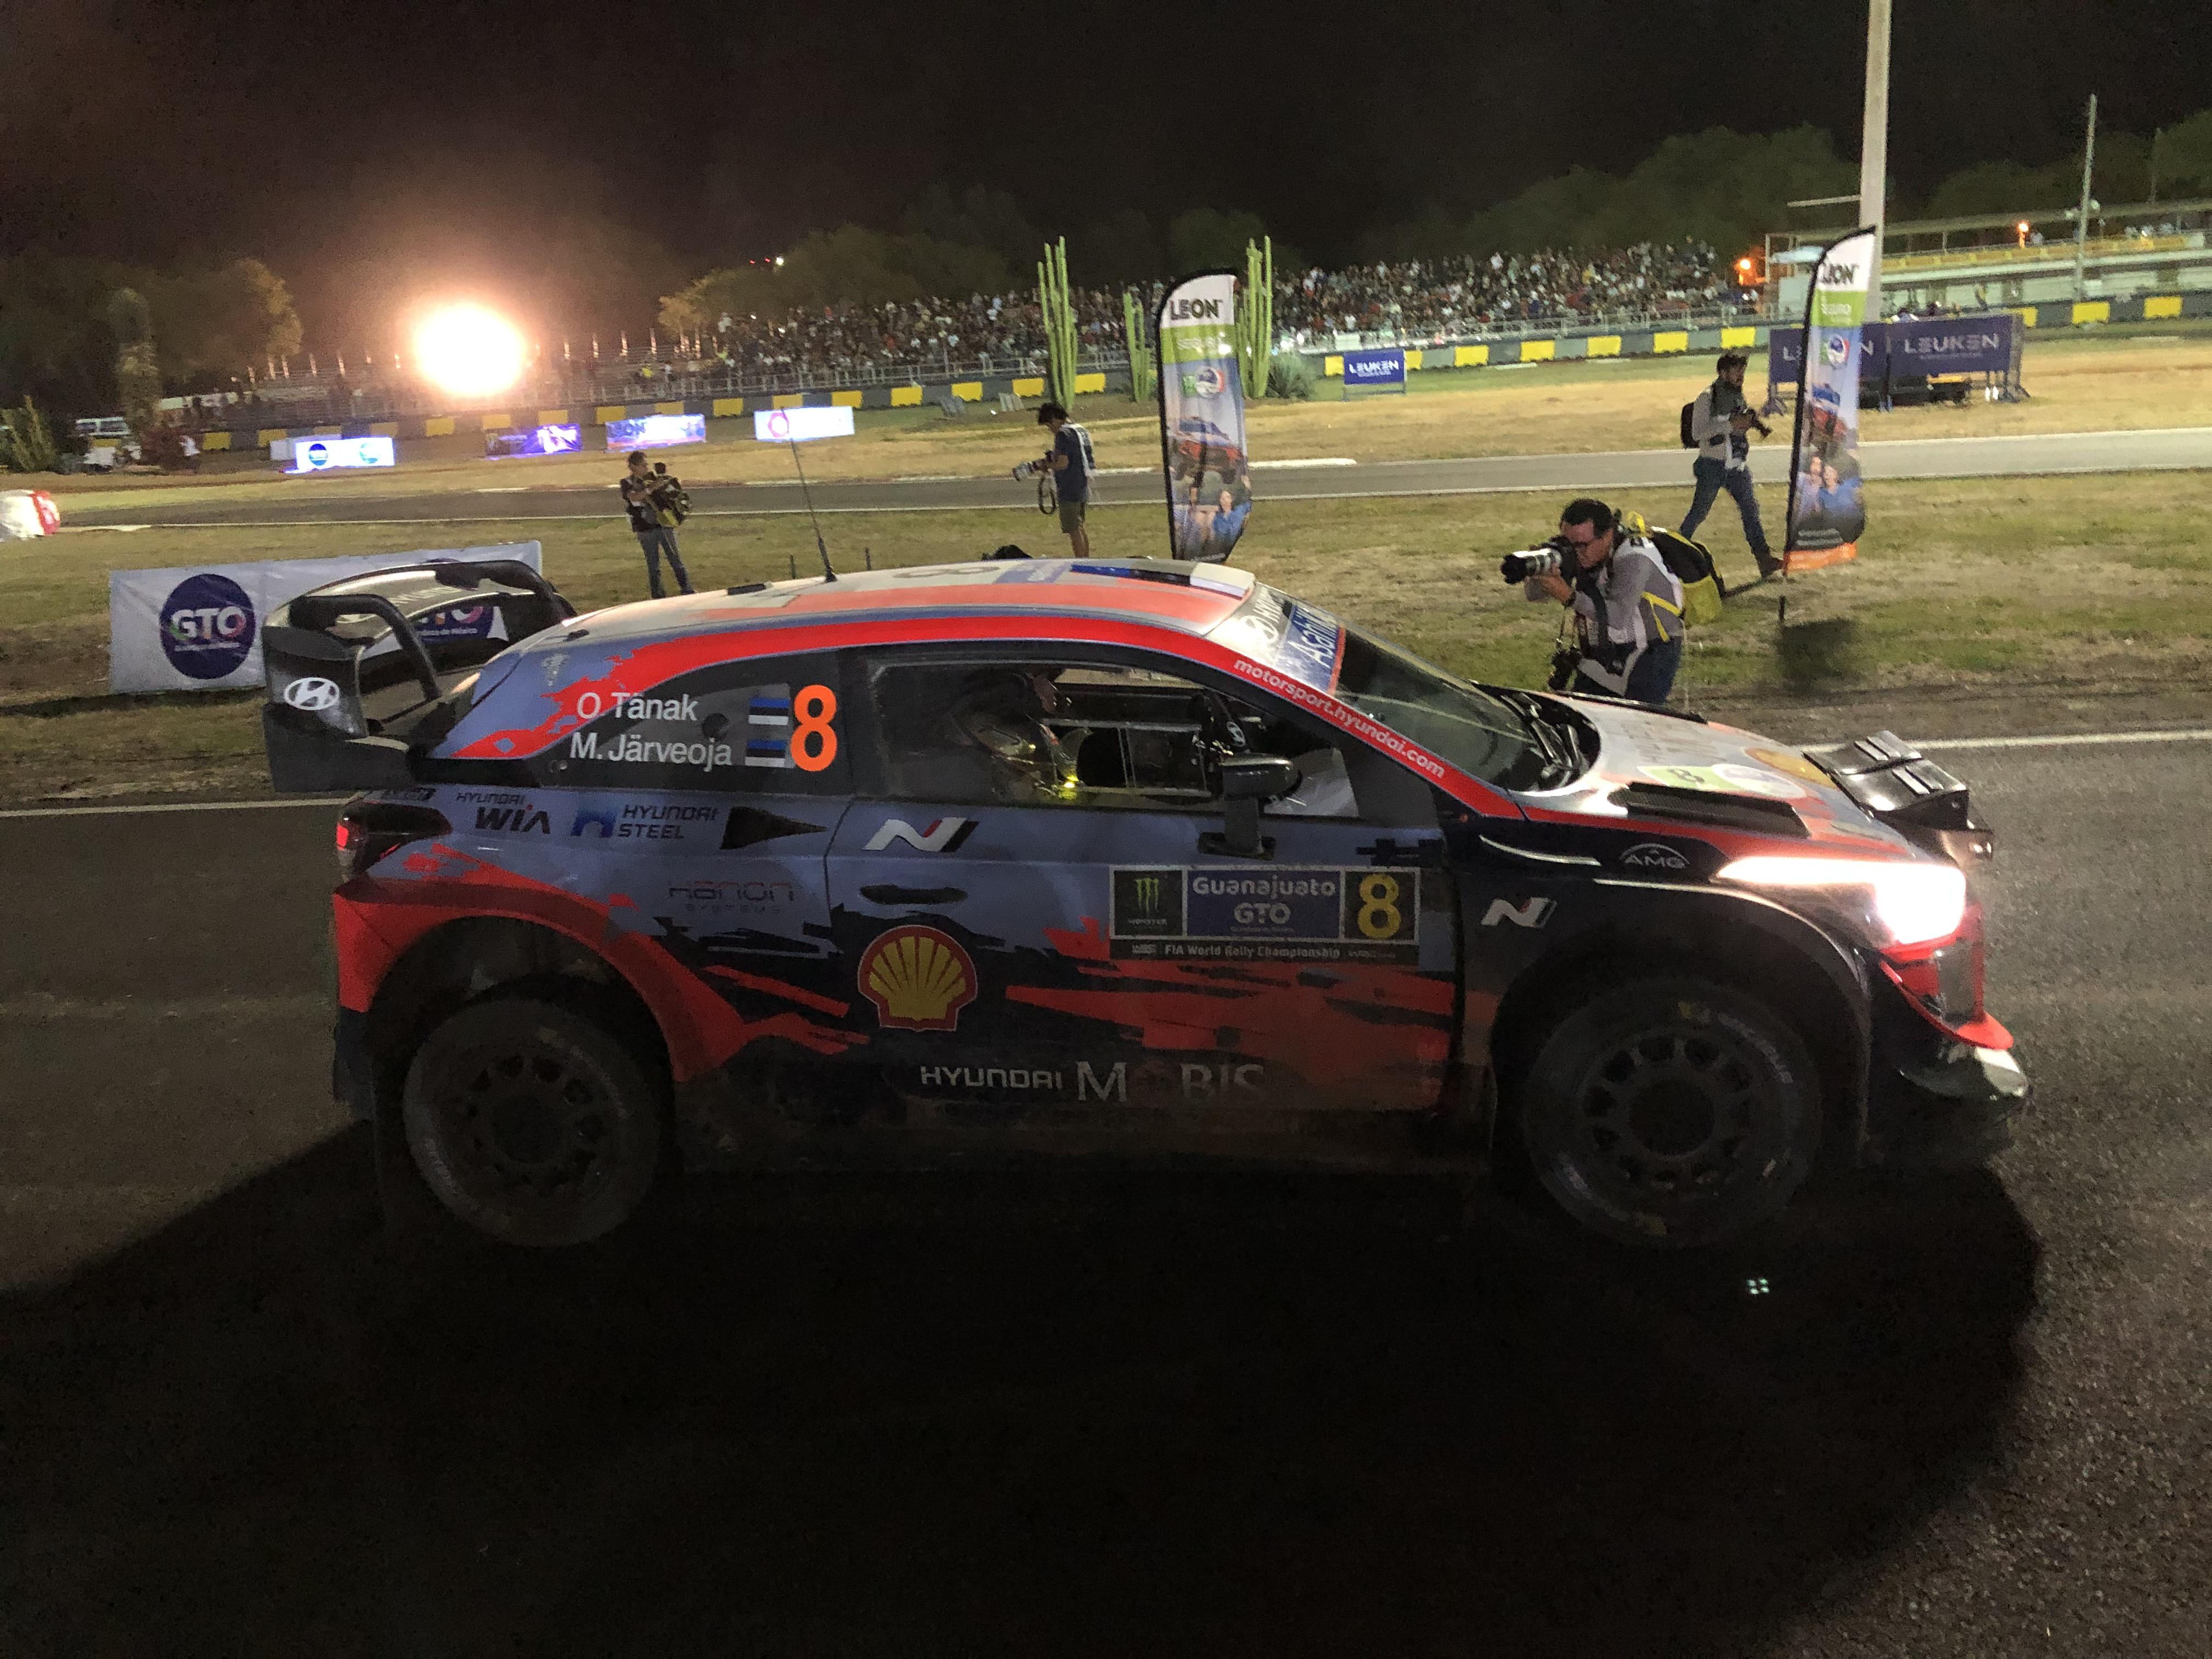 WRC: 17º Rallye Guanajuato Corona - México [12-15 Marzo] - Página 4 ETCRgcrXkAAzoN6?format=jpg&name=4096x4096